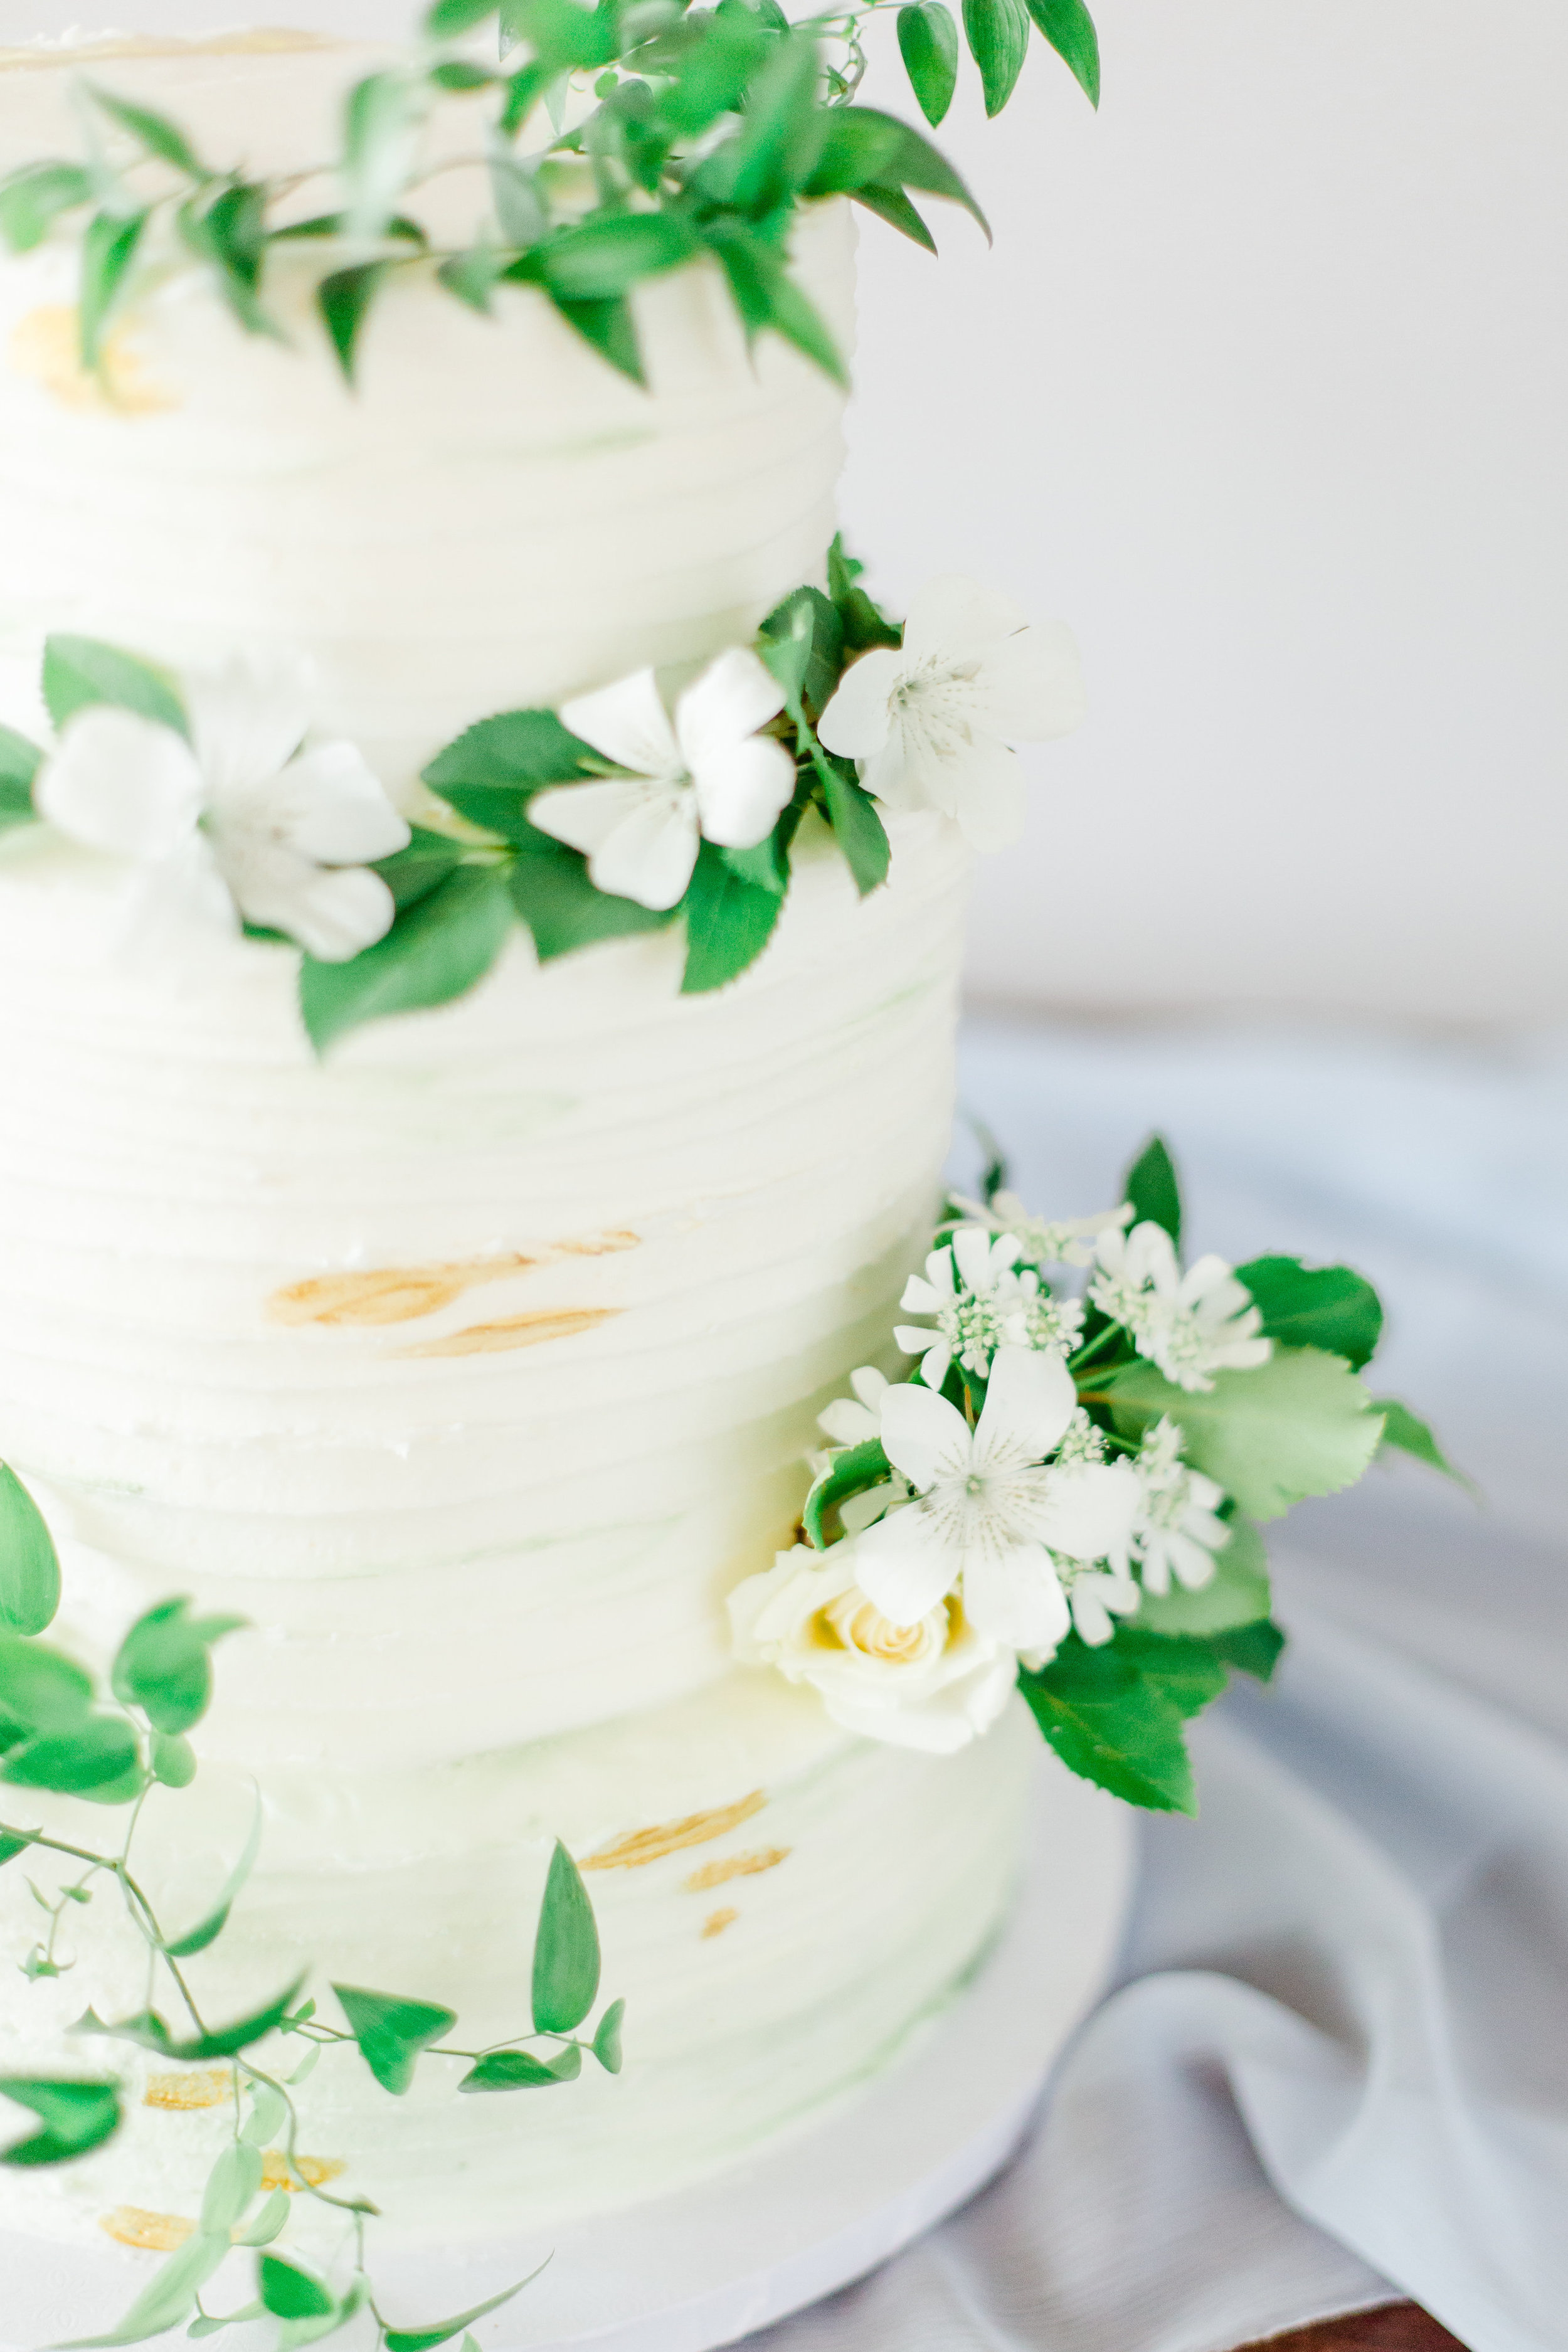 Central PA, York PA, JesSmith Designs, custom, wedding, invitations, bridal, announcements, save the date, birth, baby, motherhood, hanover, calligraphy, handlettering_807.jpg